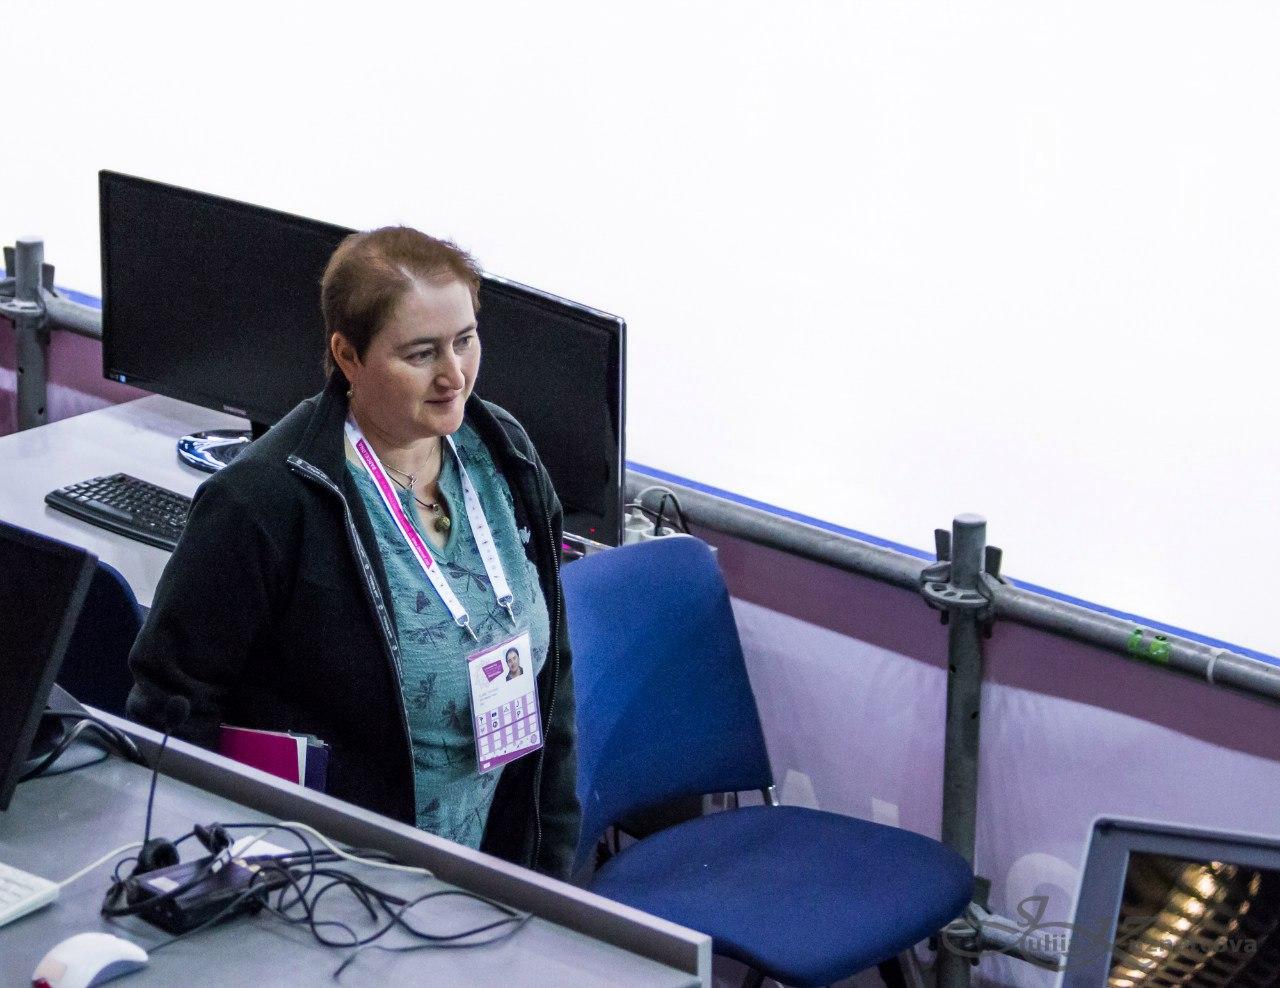 Татьяна Фладе / Tatjana Flade / Пресс-атташе ISU GmX4Ul29TOY